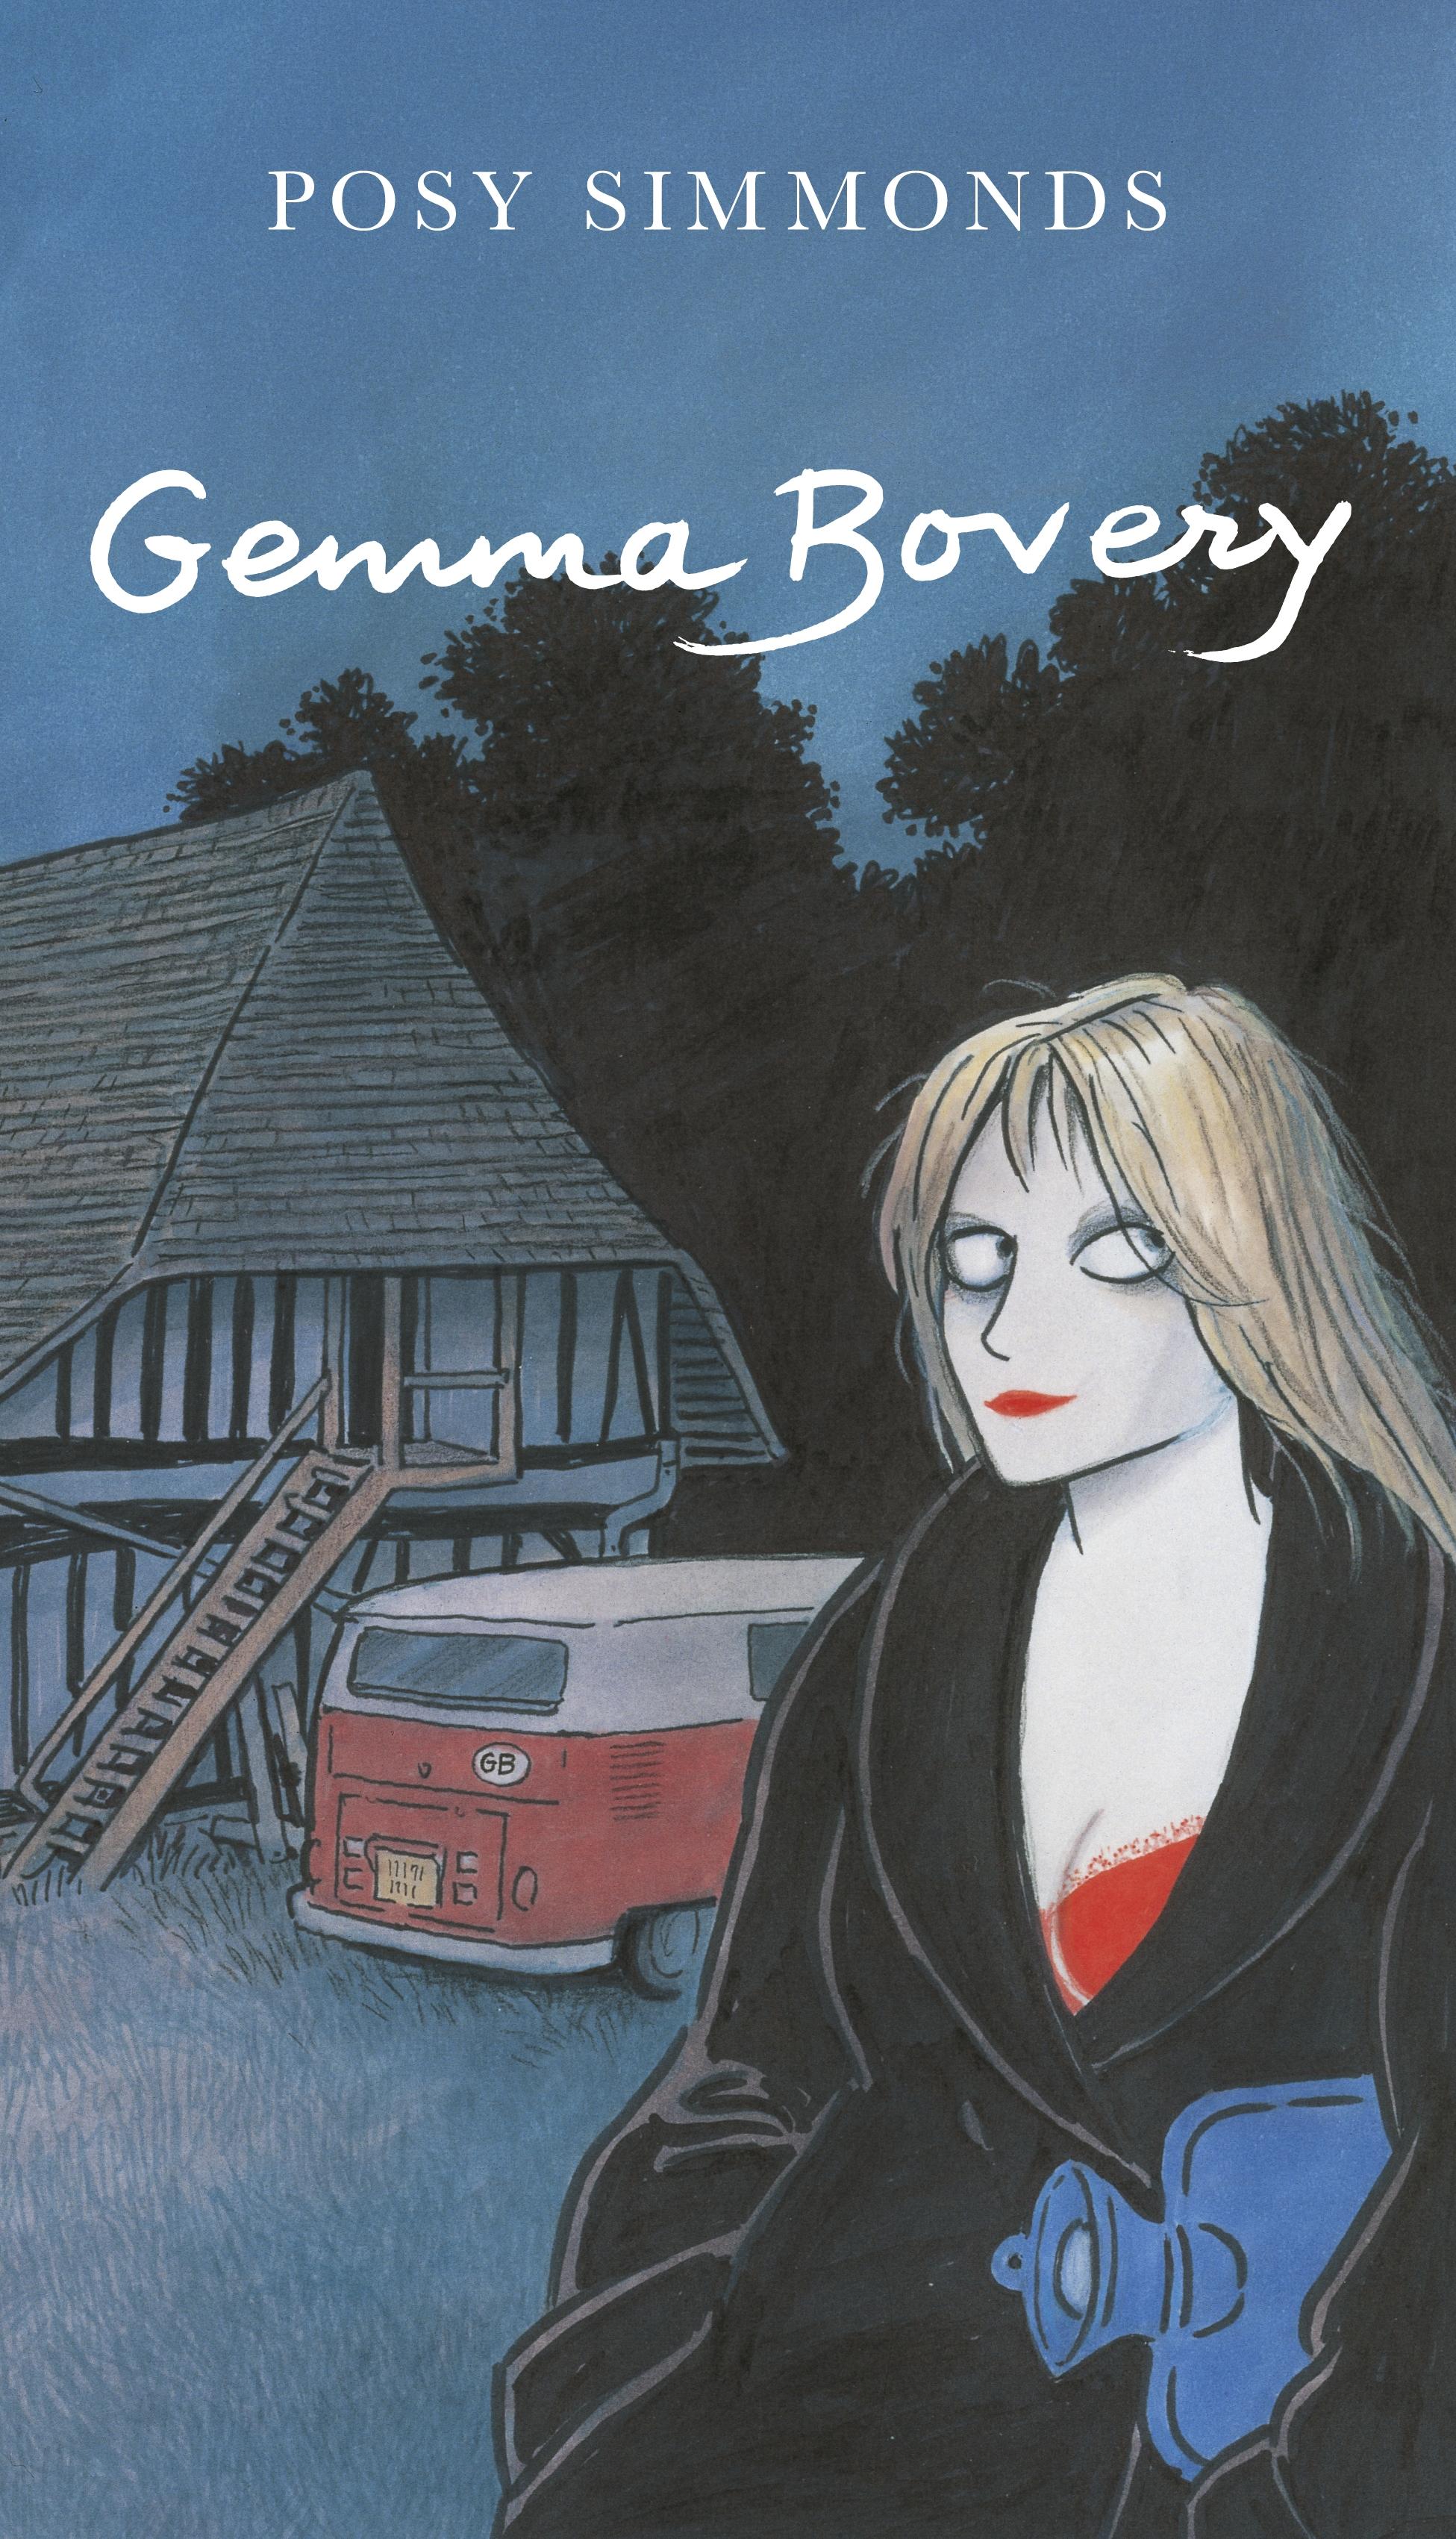 Gemma Bovery by Posy Simmonds - Penguin Books Australia